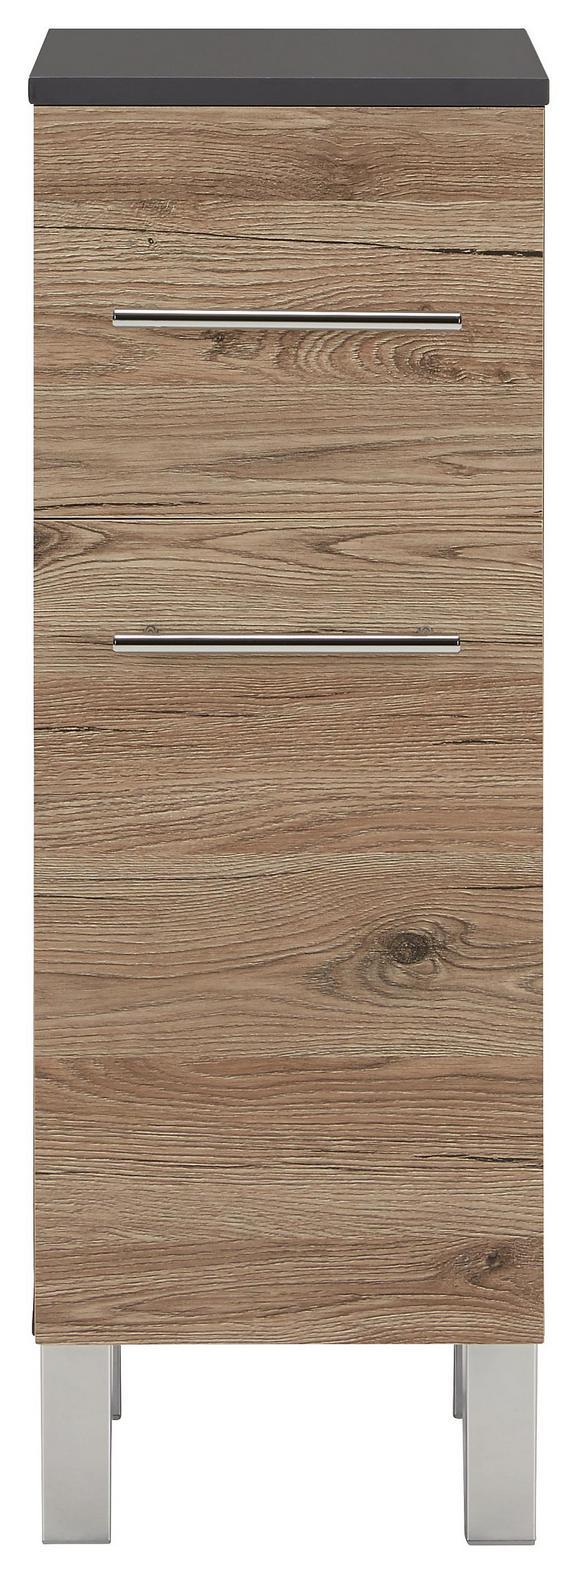 Spodnja Omarica Garziello - hrast/krom, Moderno, kovina/leseni material (31/86/32cm) - Mömax modern living